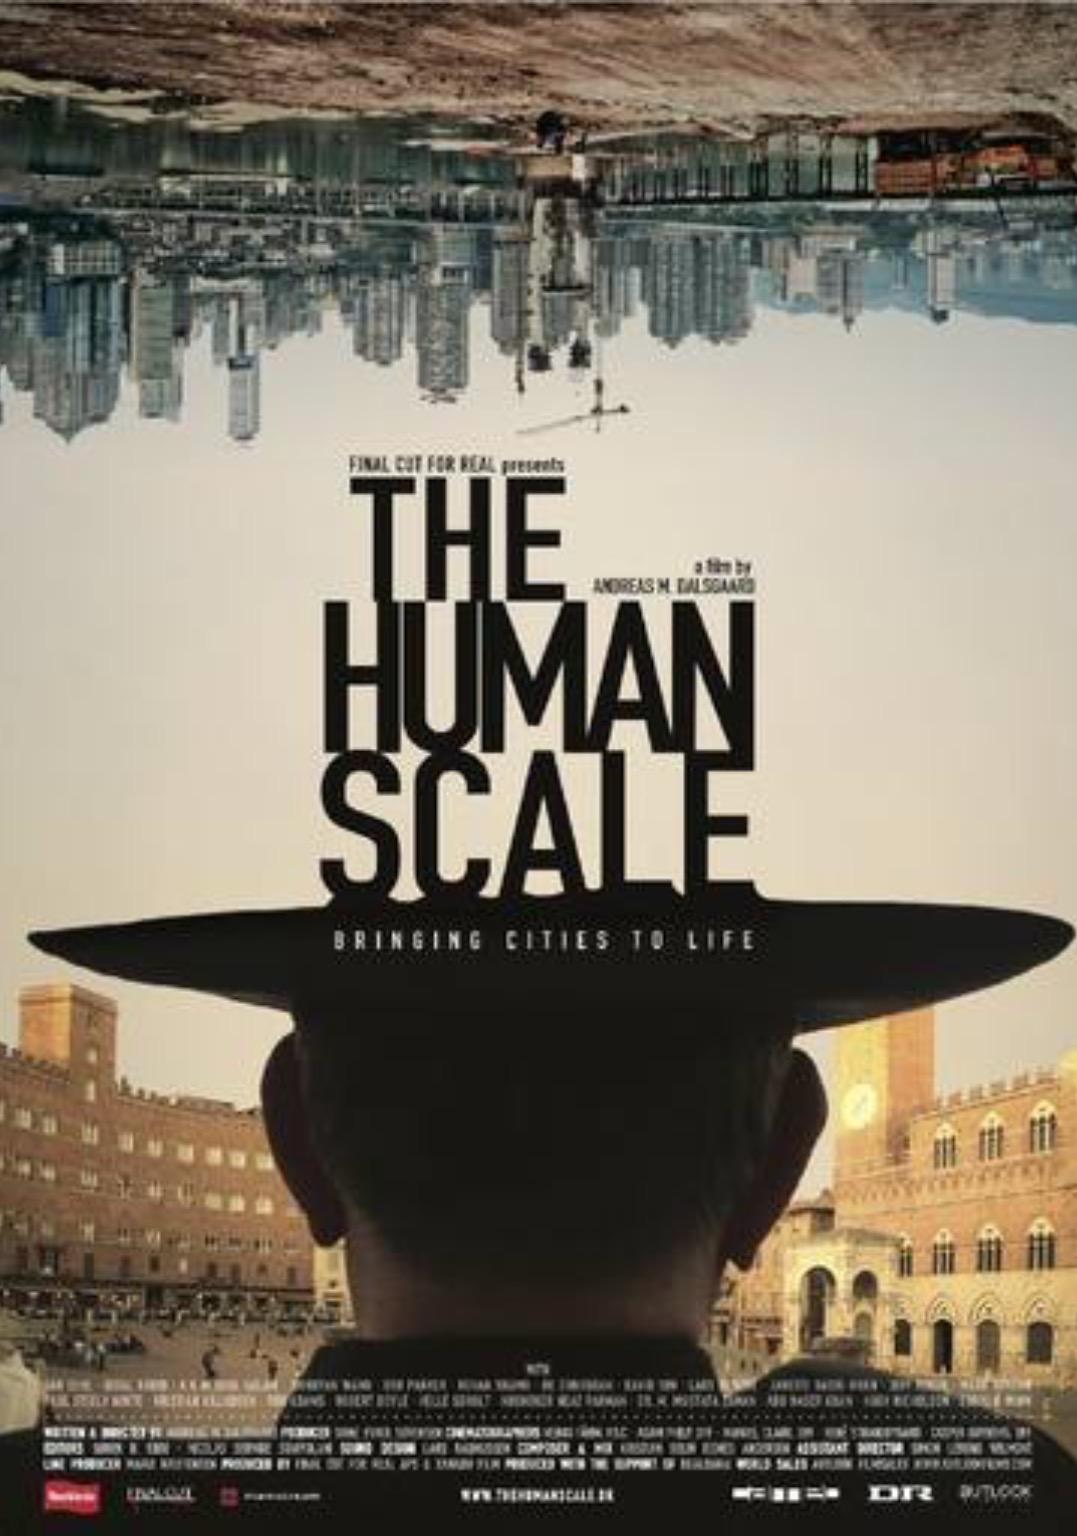 Human escale